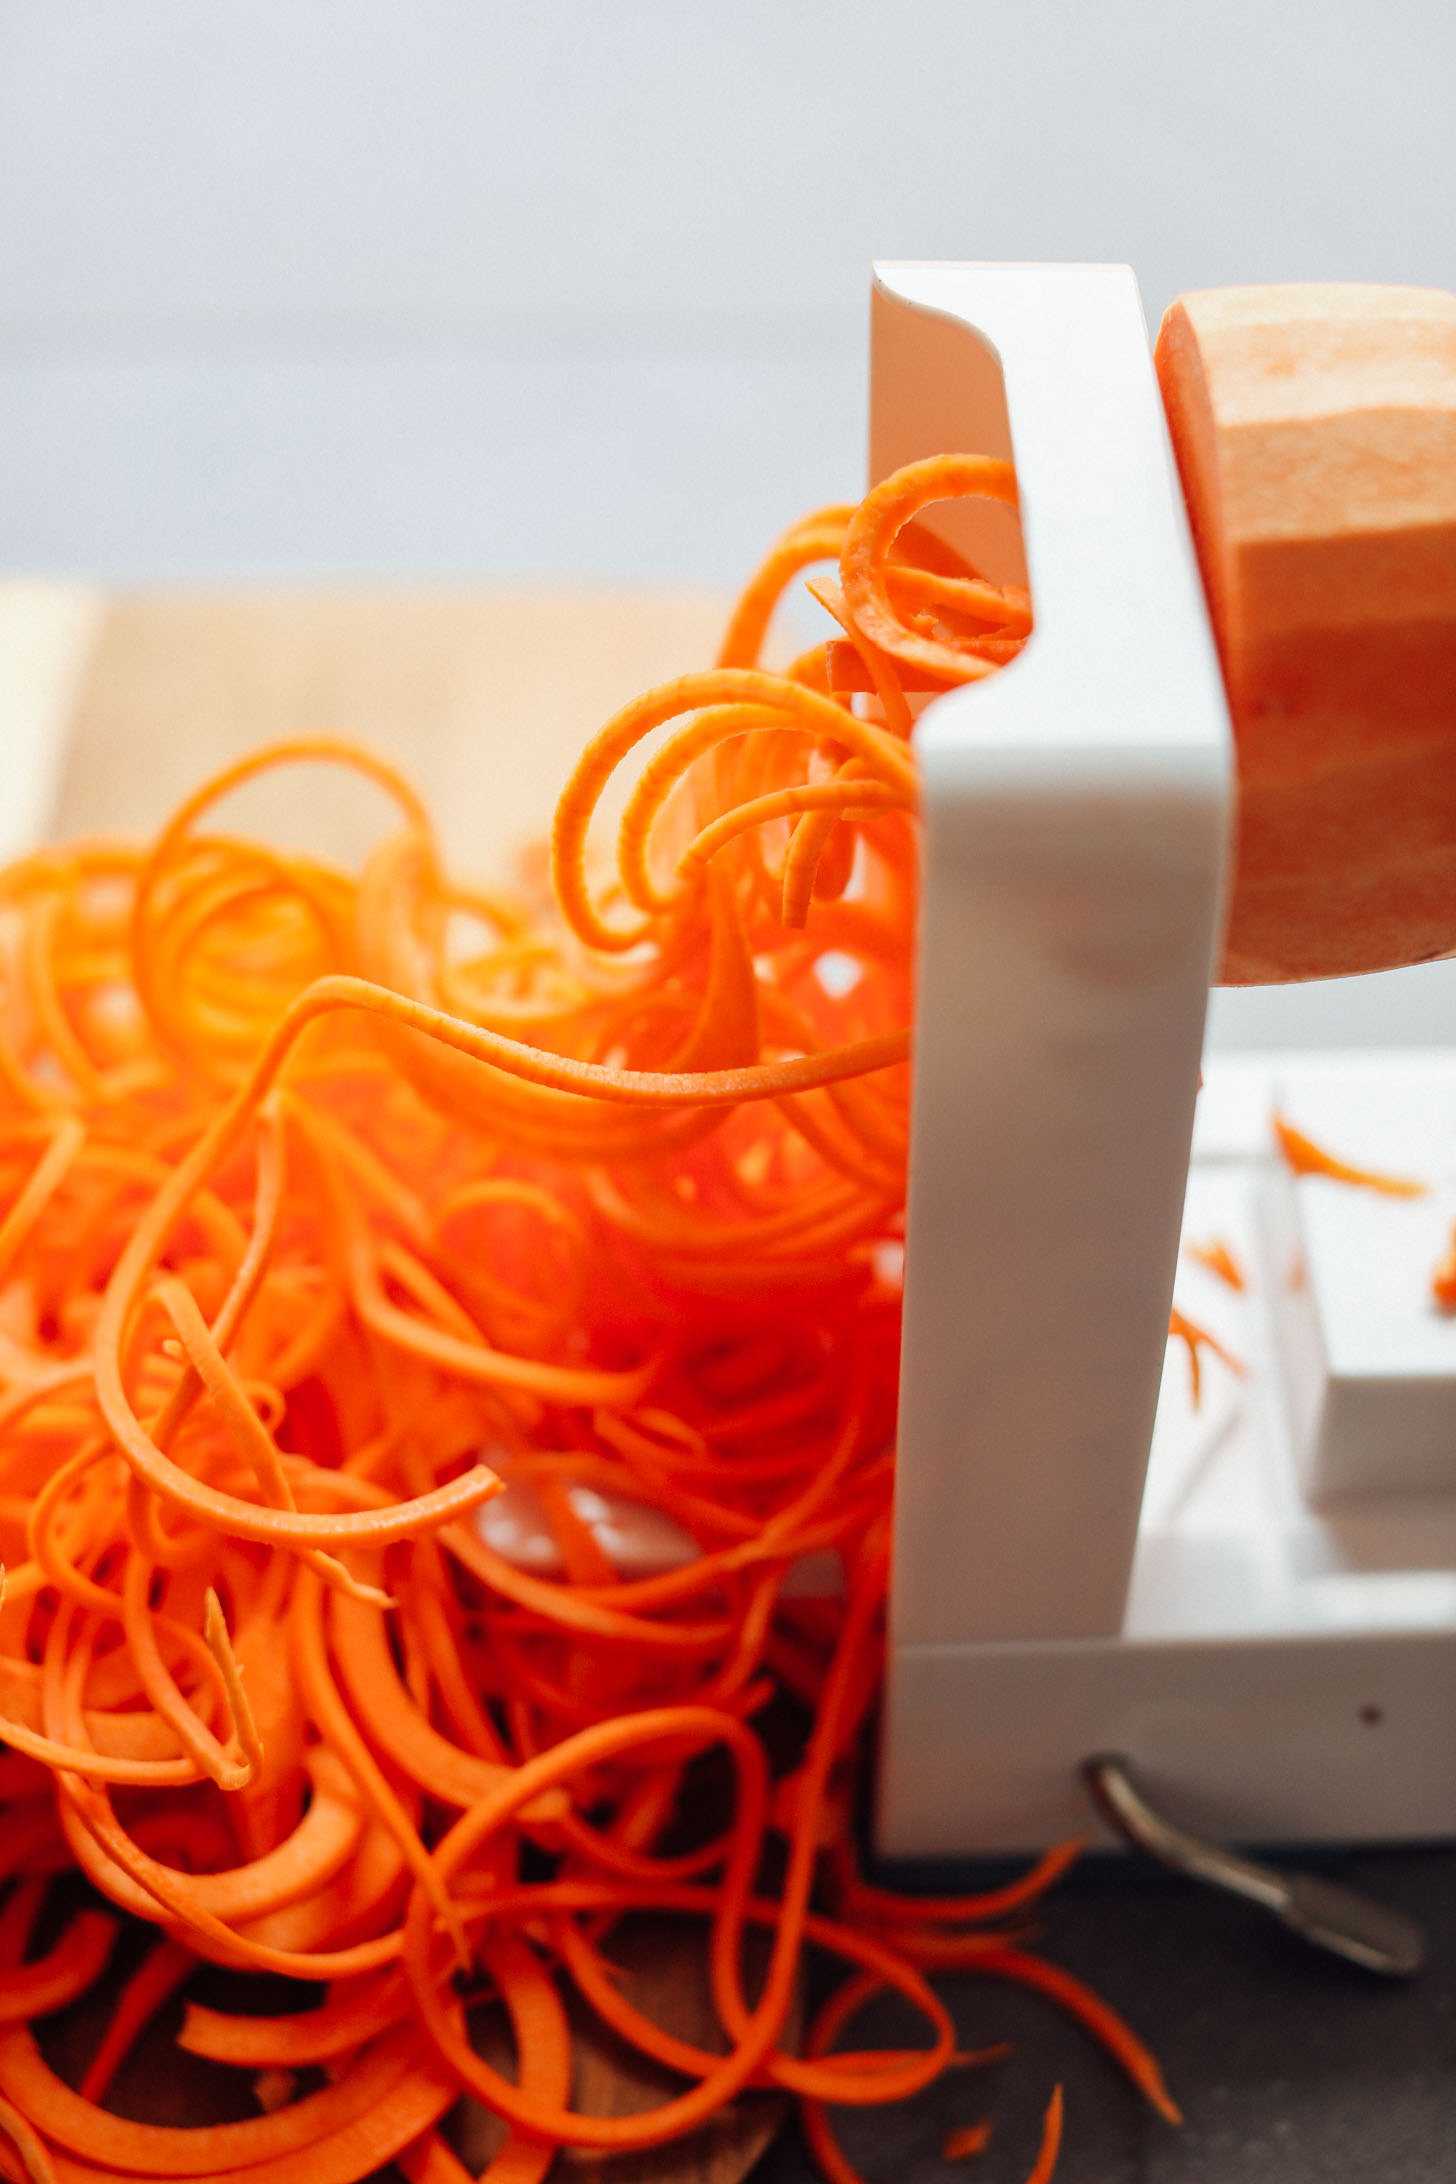 Pinterest Sweetness Rodney Ig Ebony Rod: Garlicky Alfredo Sweet Potato Noodles